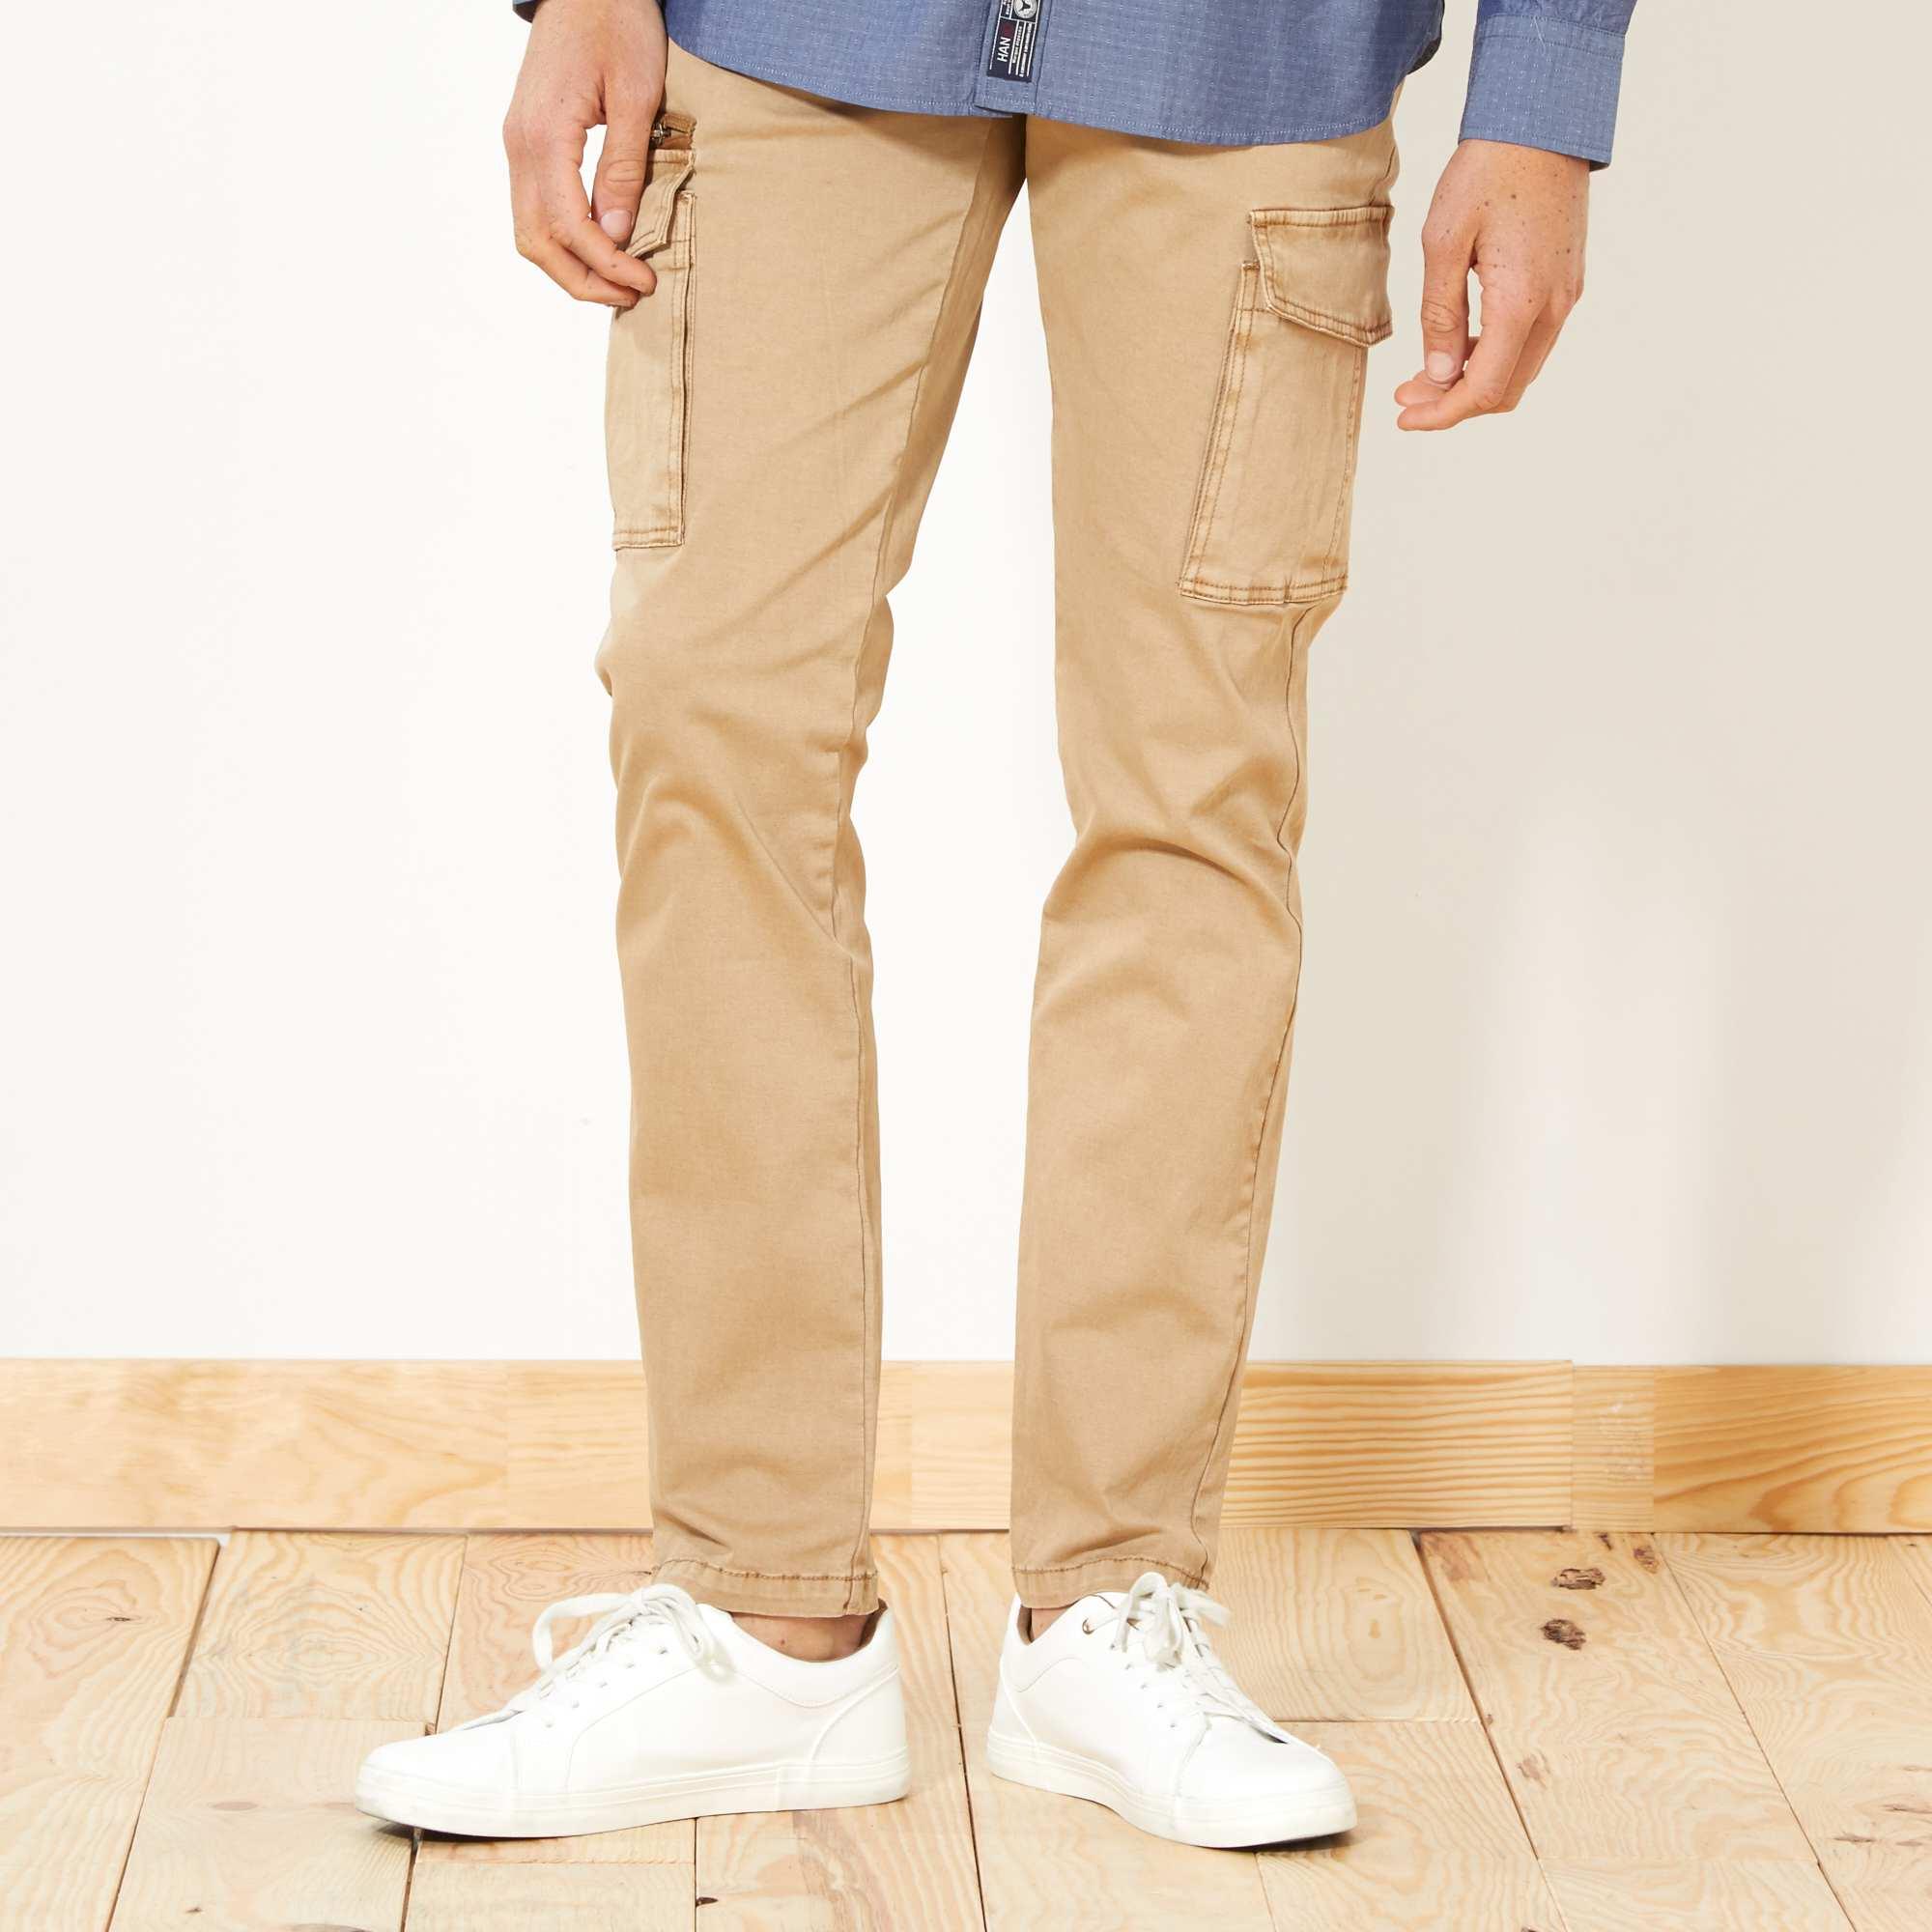 9c75d667d7 Pantalón slim con bolsillos cargo BEIGE Hombre. Loading zoom